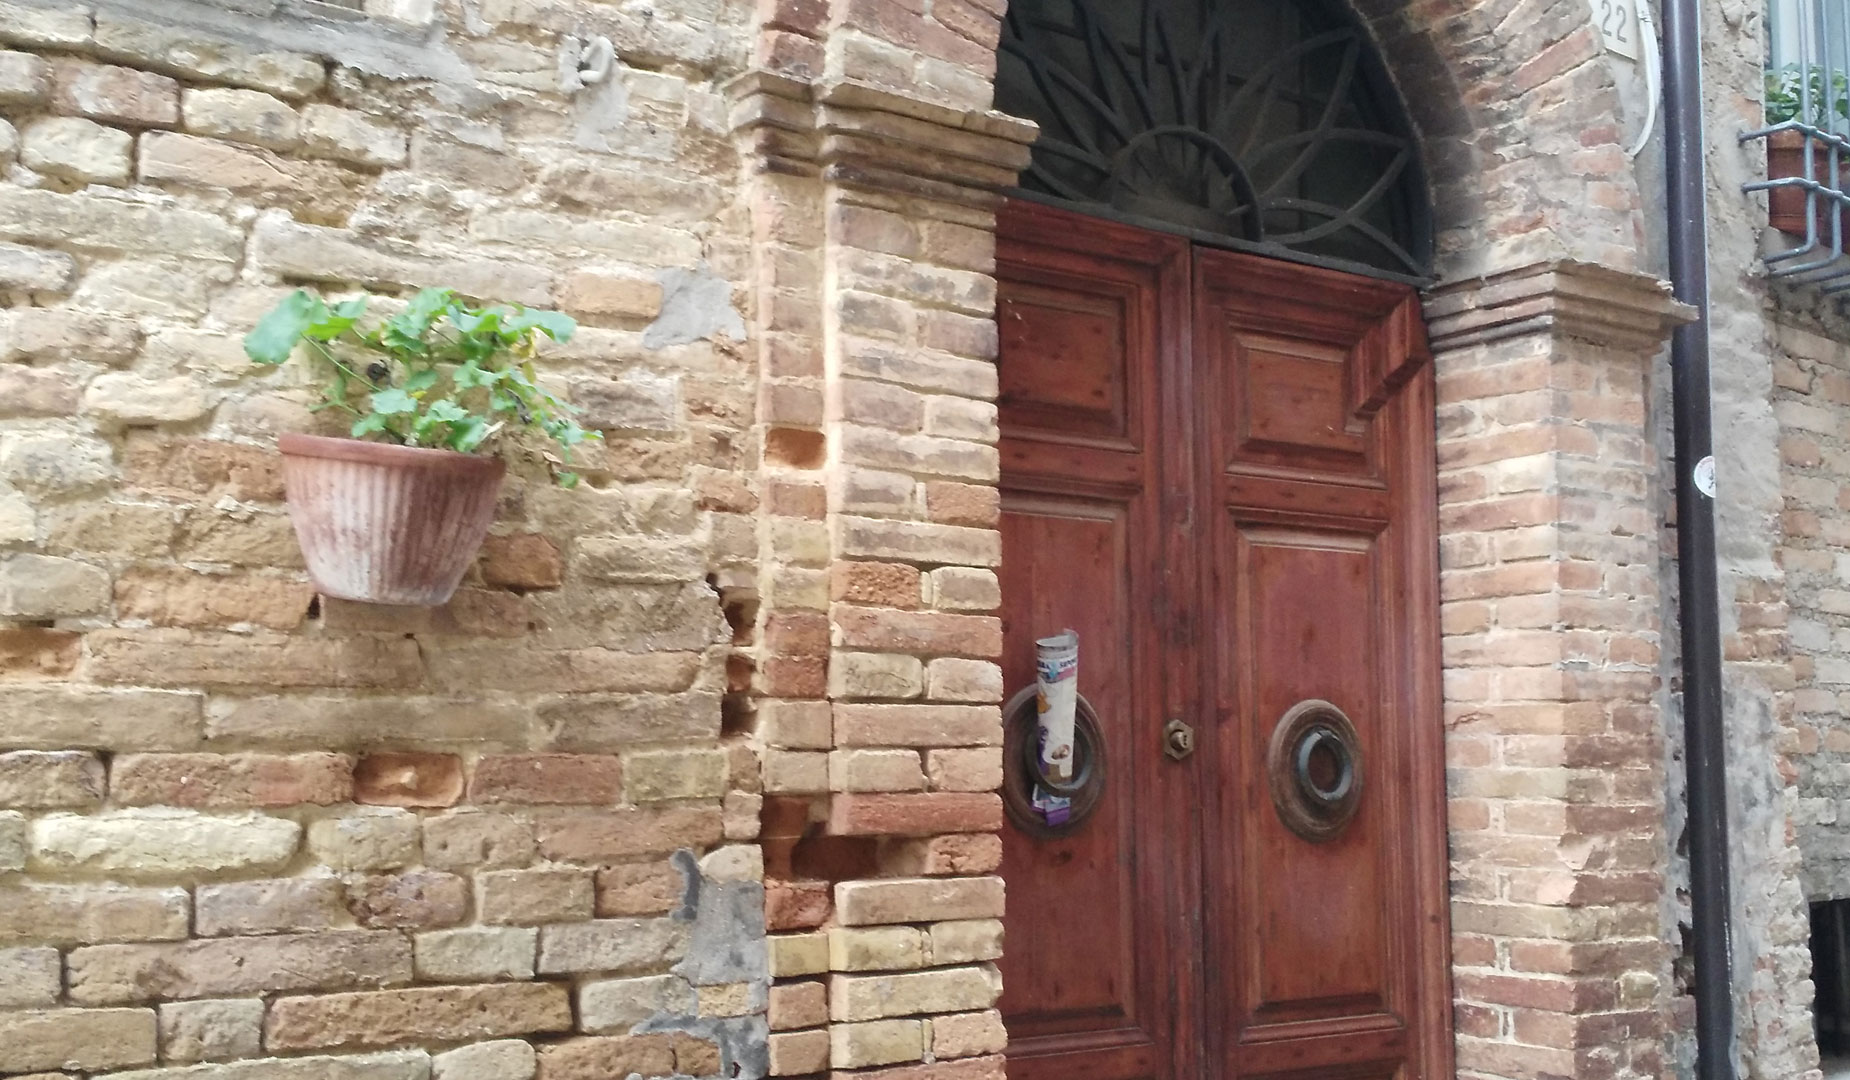 sant'elpidio a mare architettura medievale